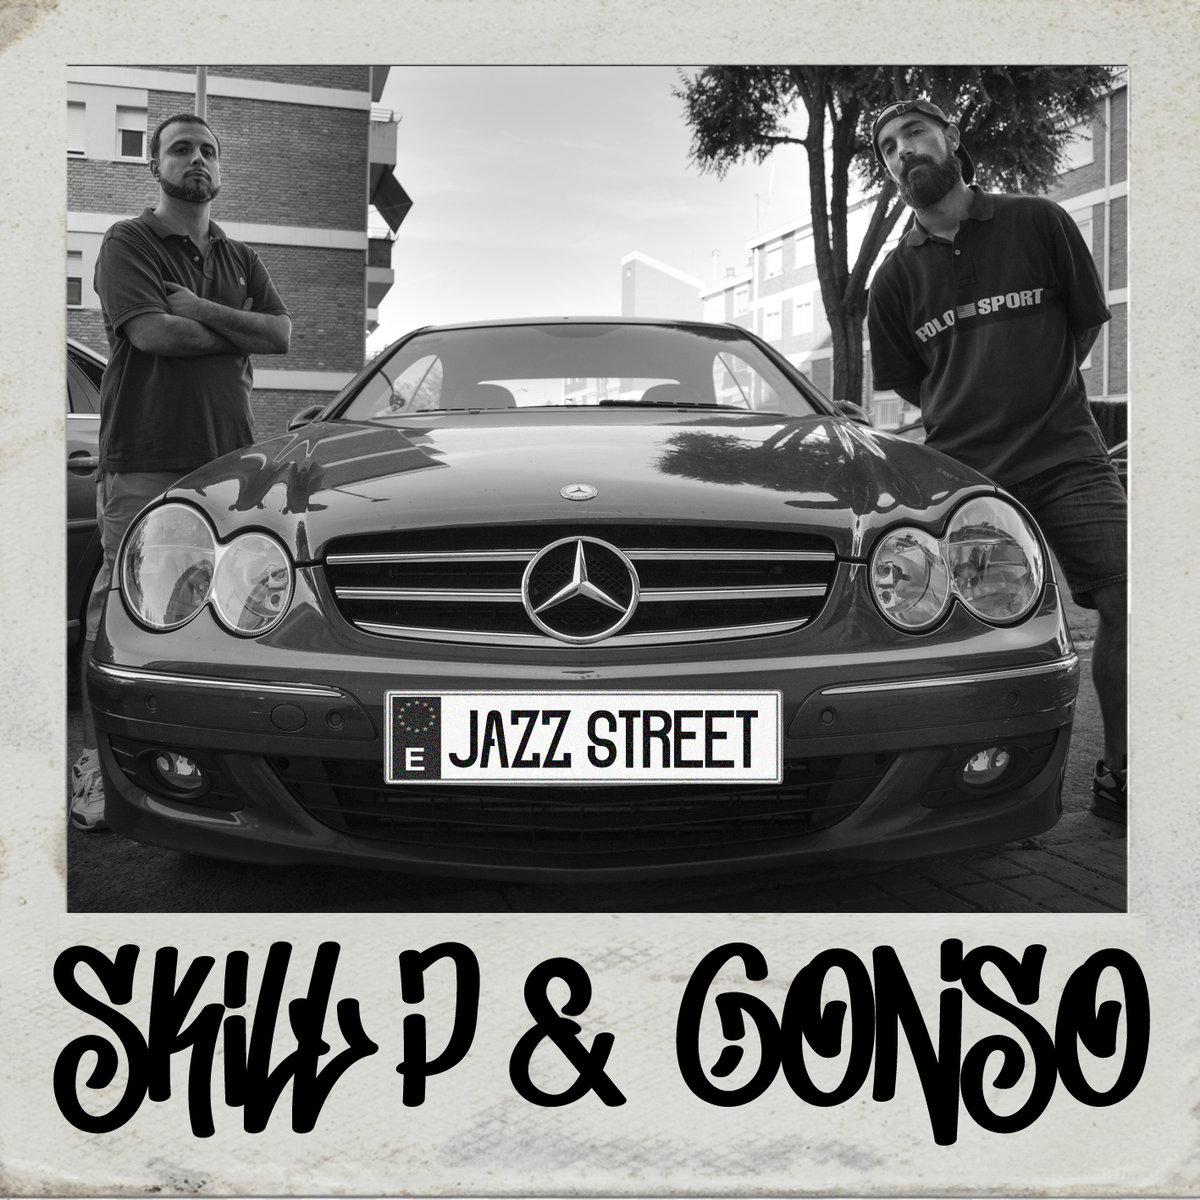 Skill_p_gonso_jazz_street